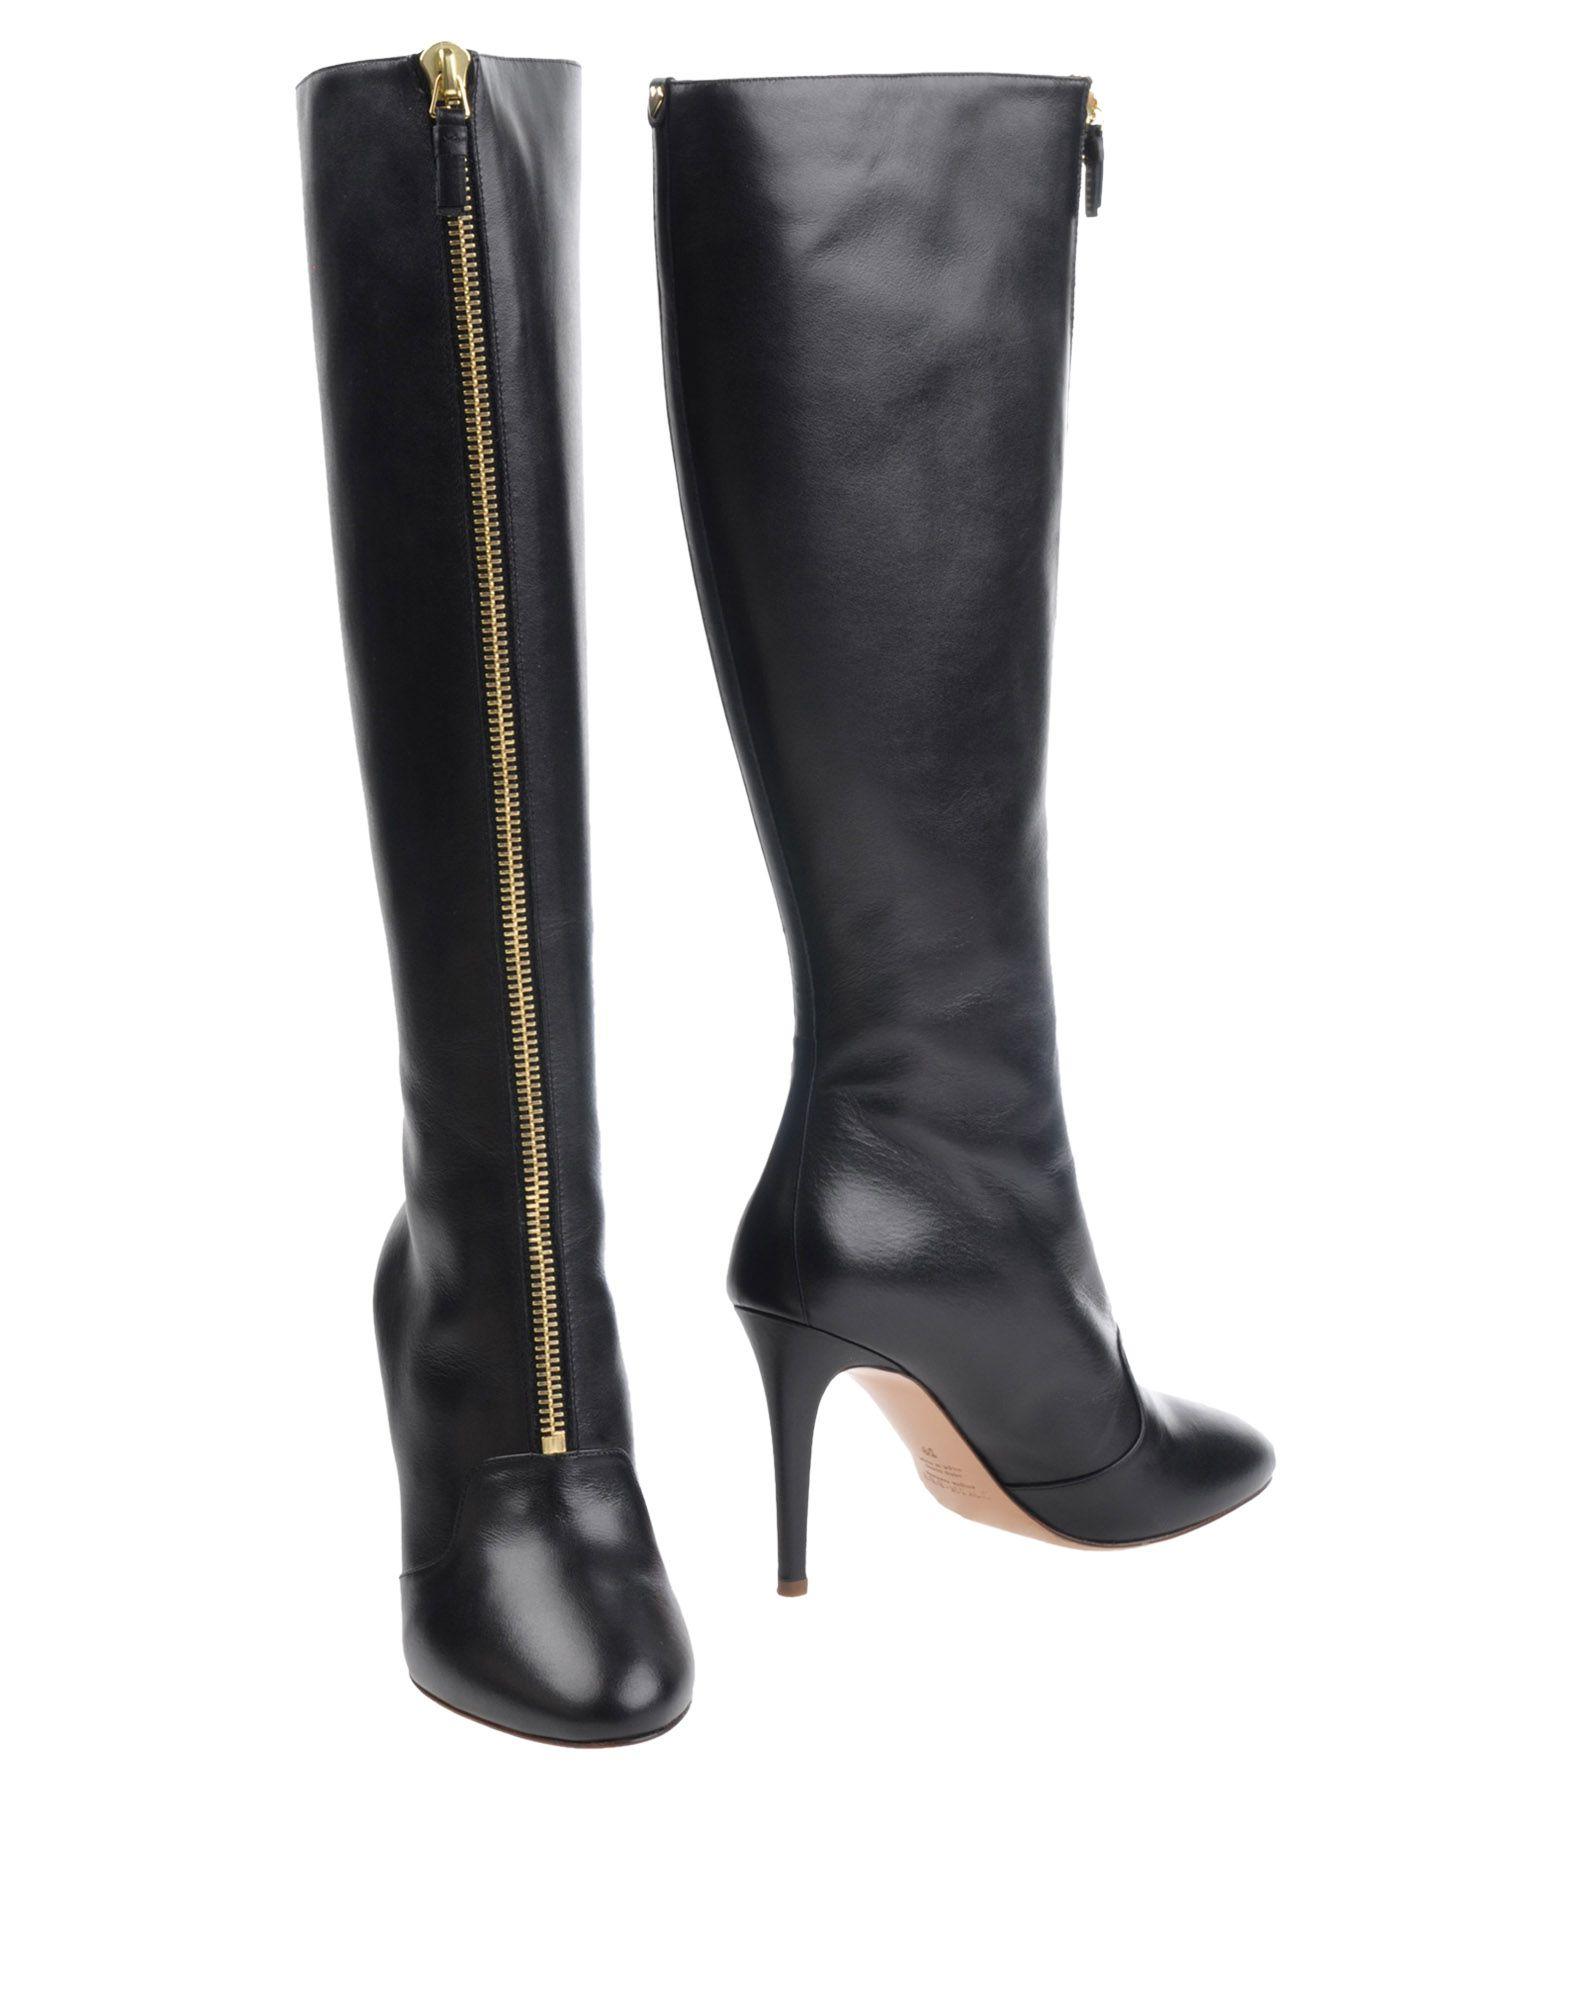 Haltbare Mode Mode Haltbare billige Schuhe Twin 11277254HL Beliebte Schuhe b5953b